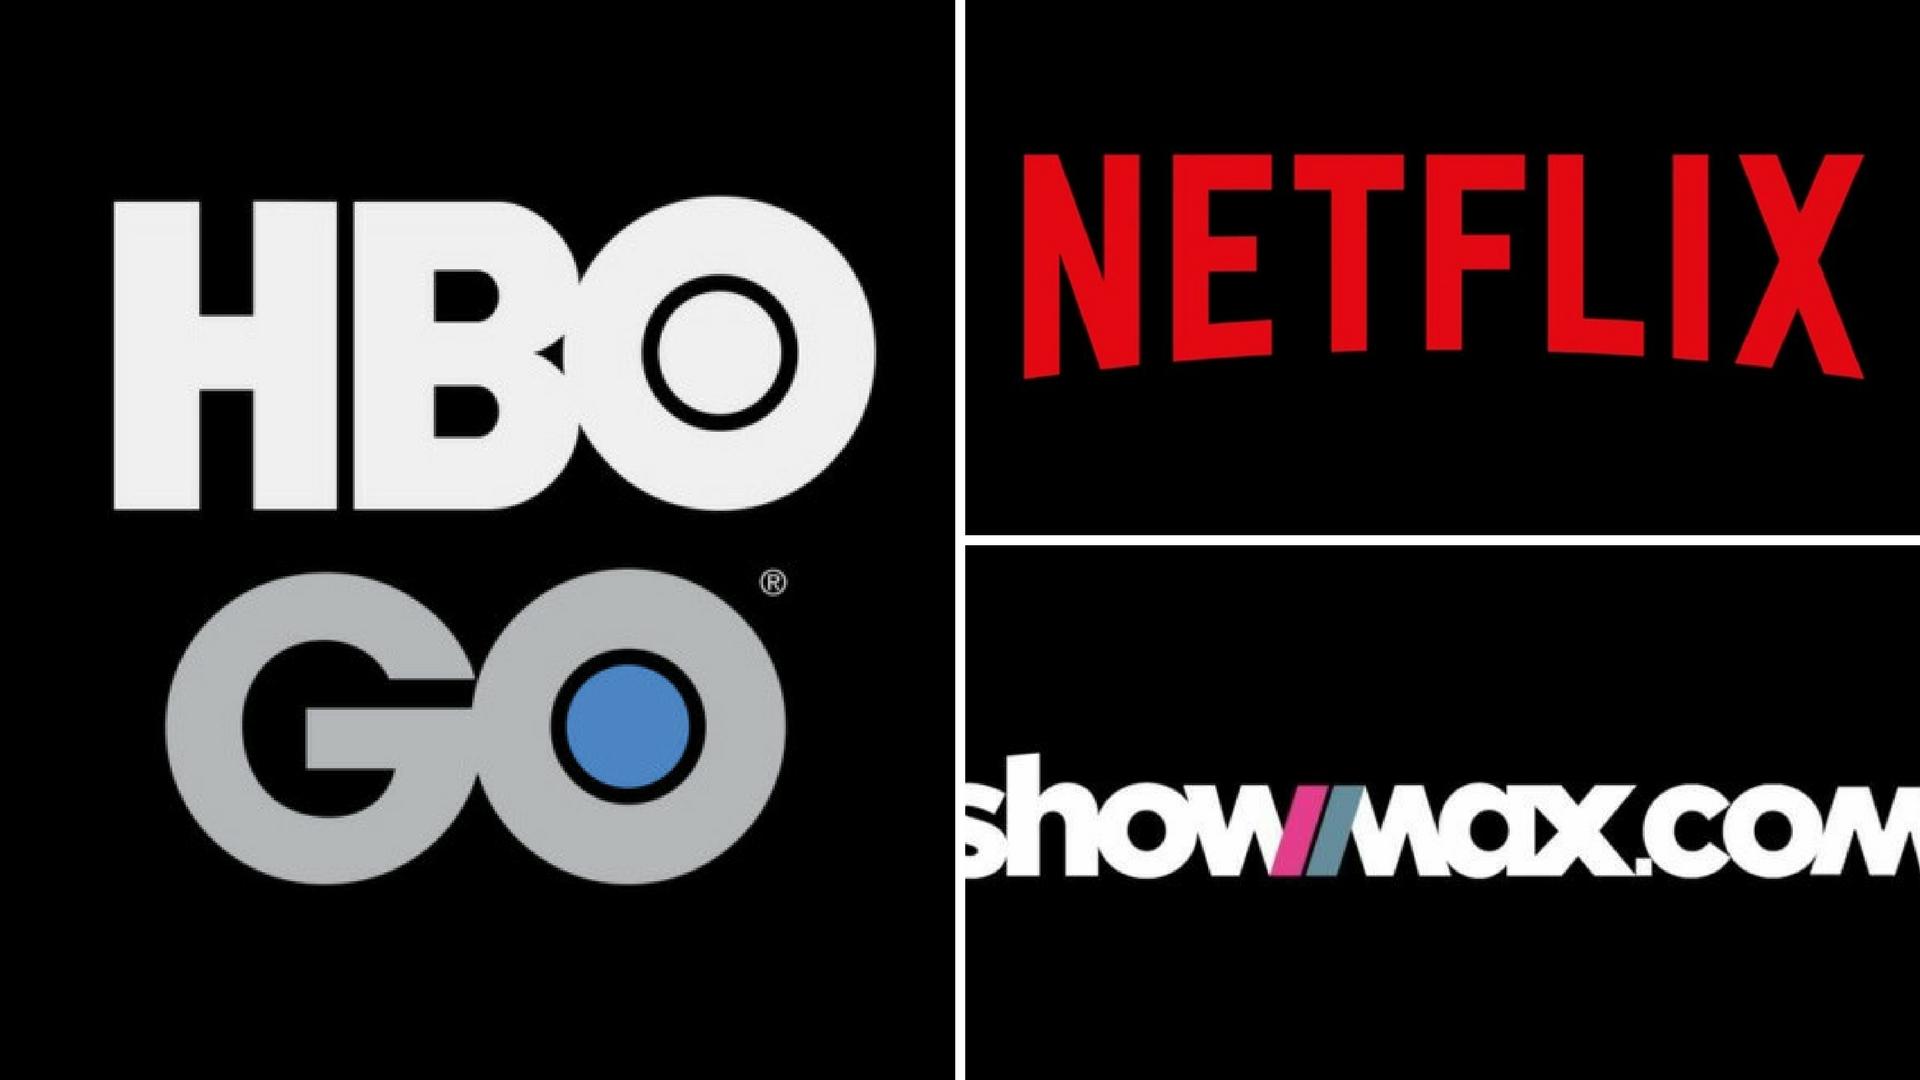 Netflix HBO.jpg